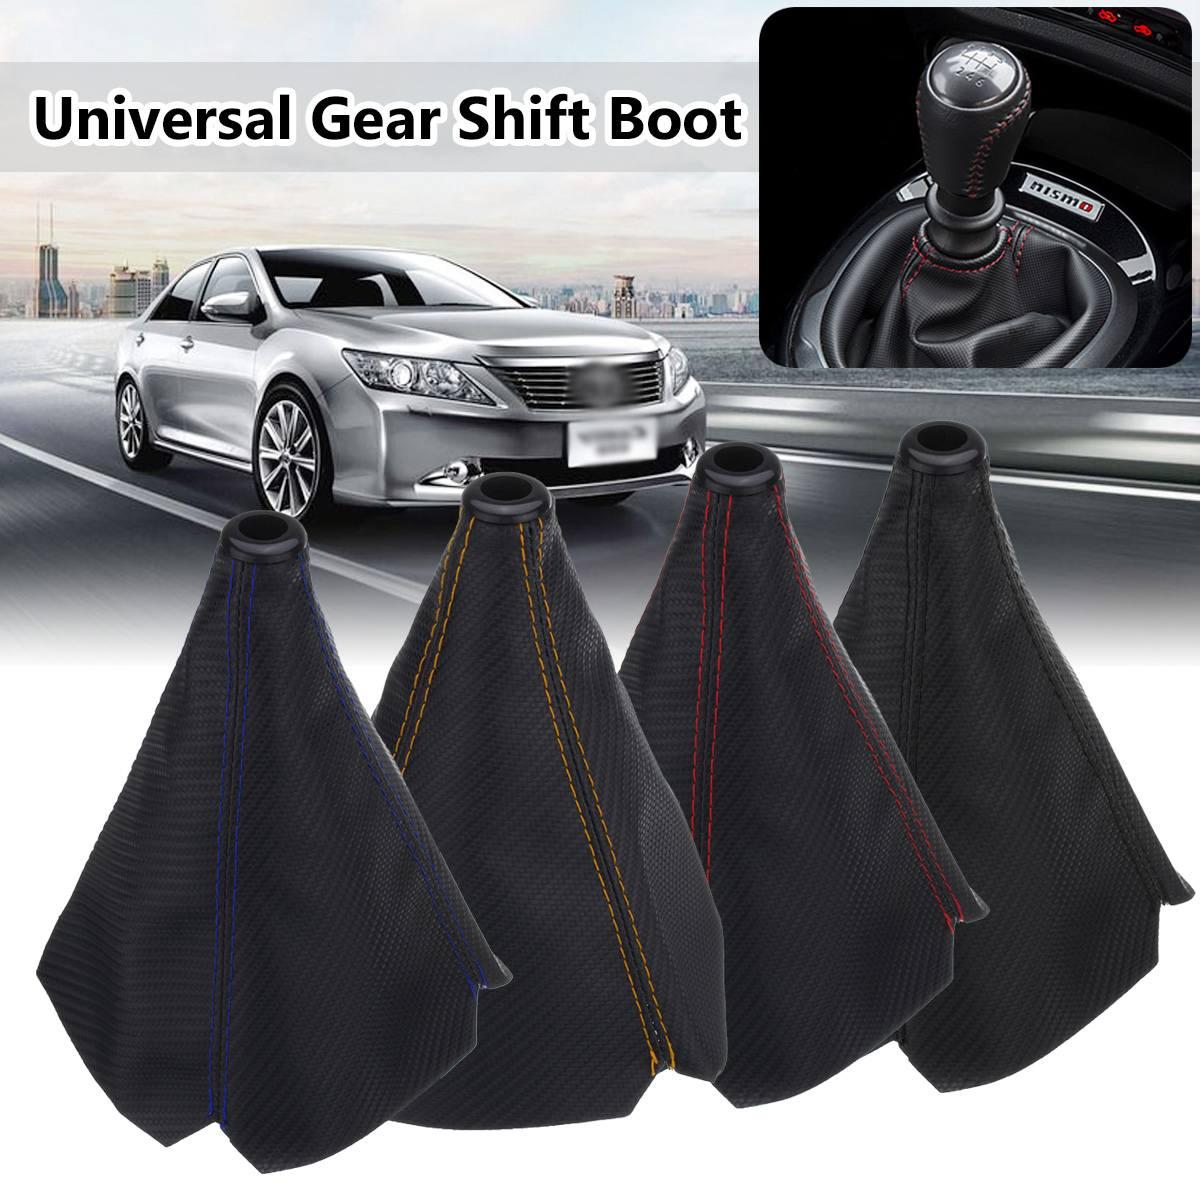 Universal Carbon Fiber Car Auto Gear Shift Collars Car Manual Shifter Gear Shift Boot Cover Gaiter